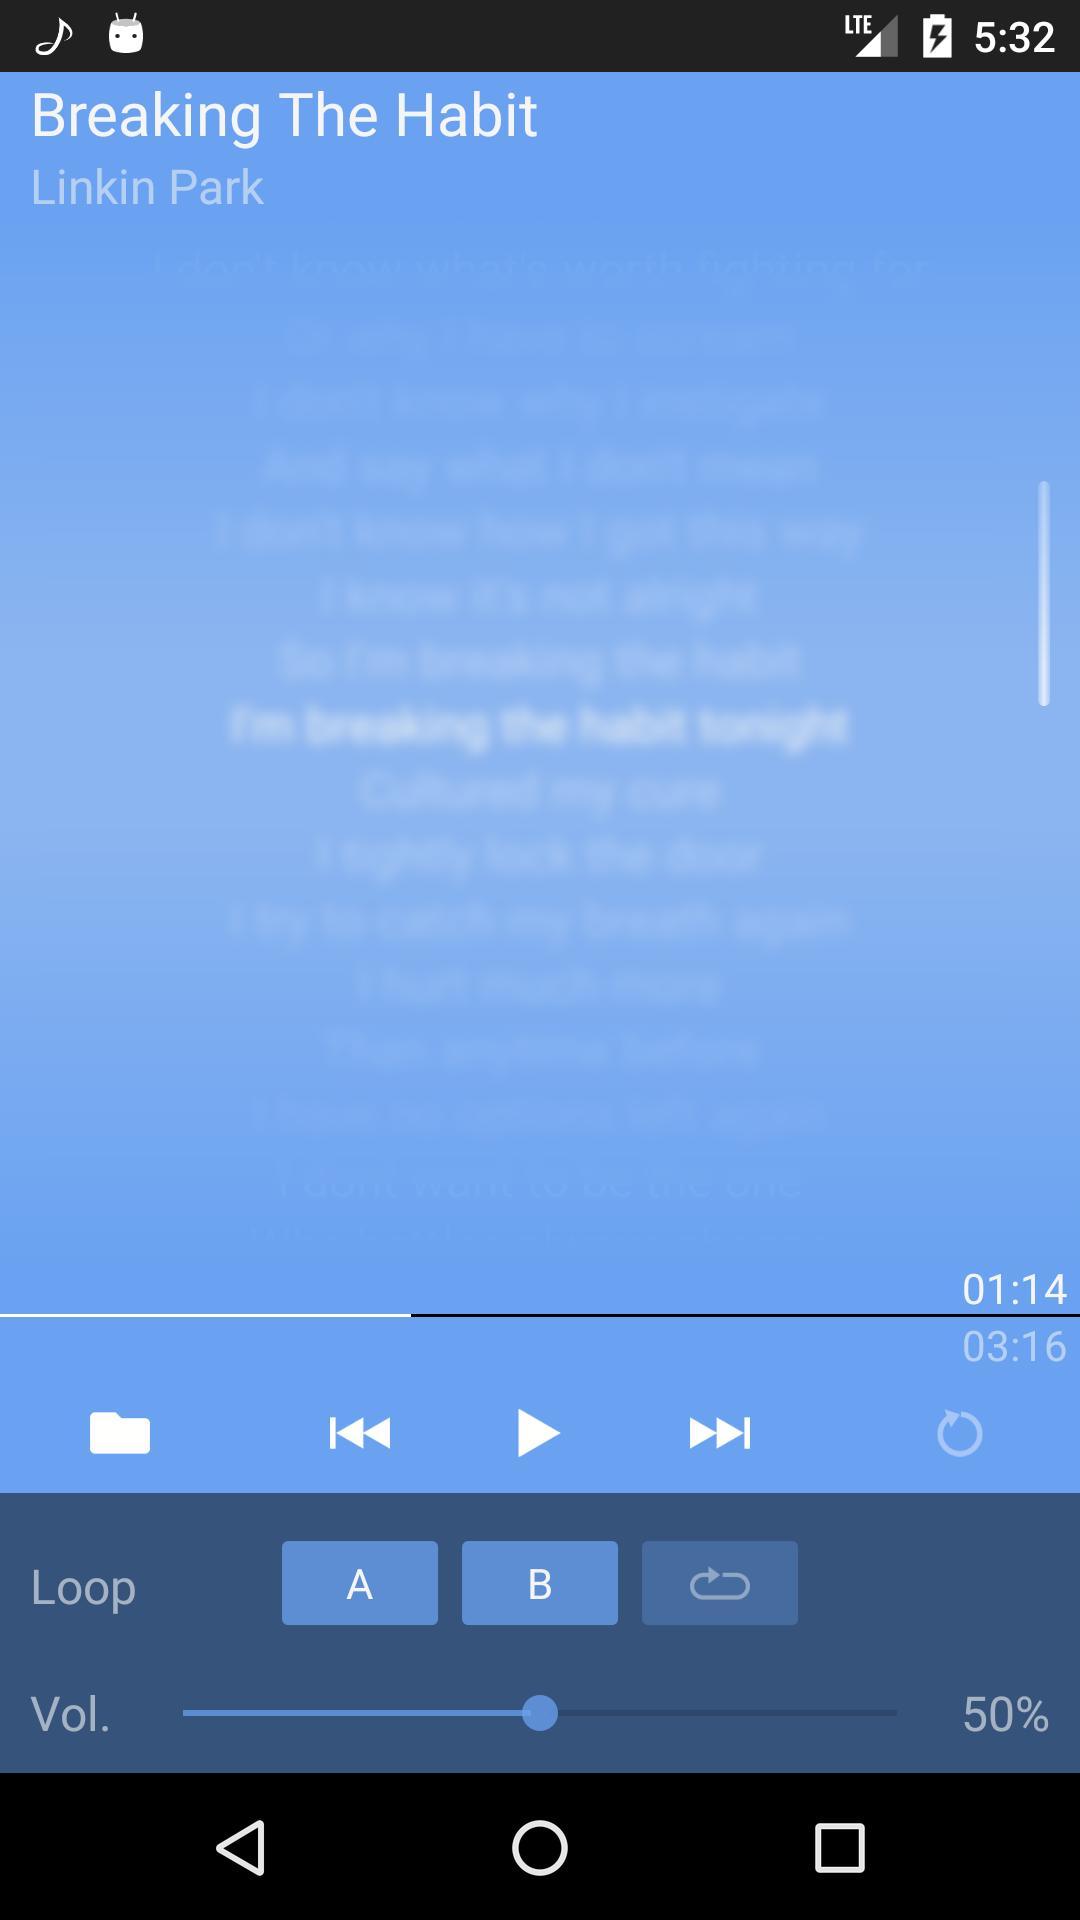 LRC Lyrics Player cho Android - Tải về APK